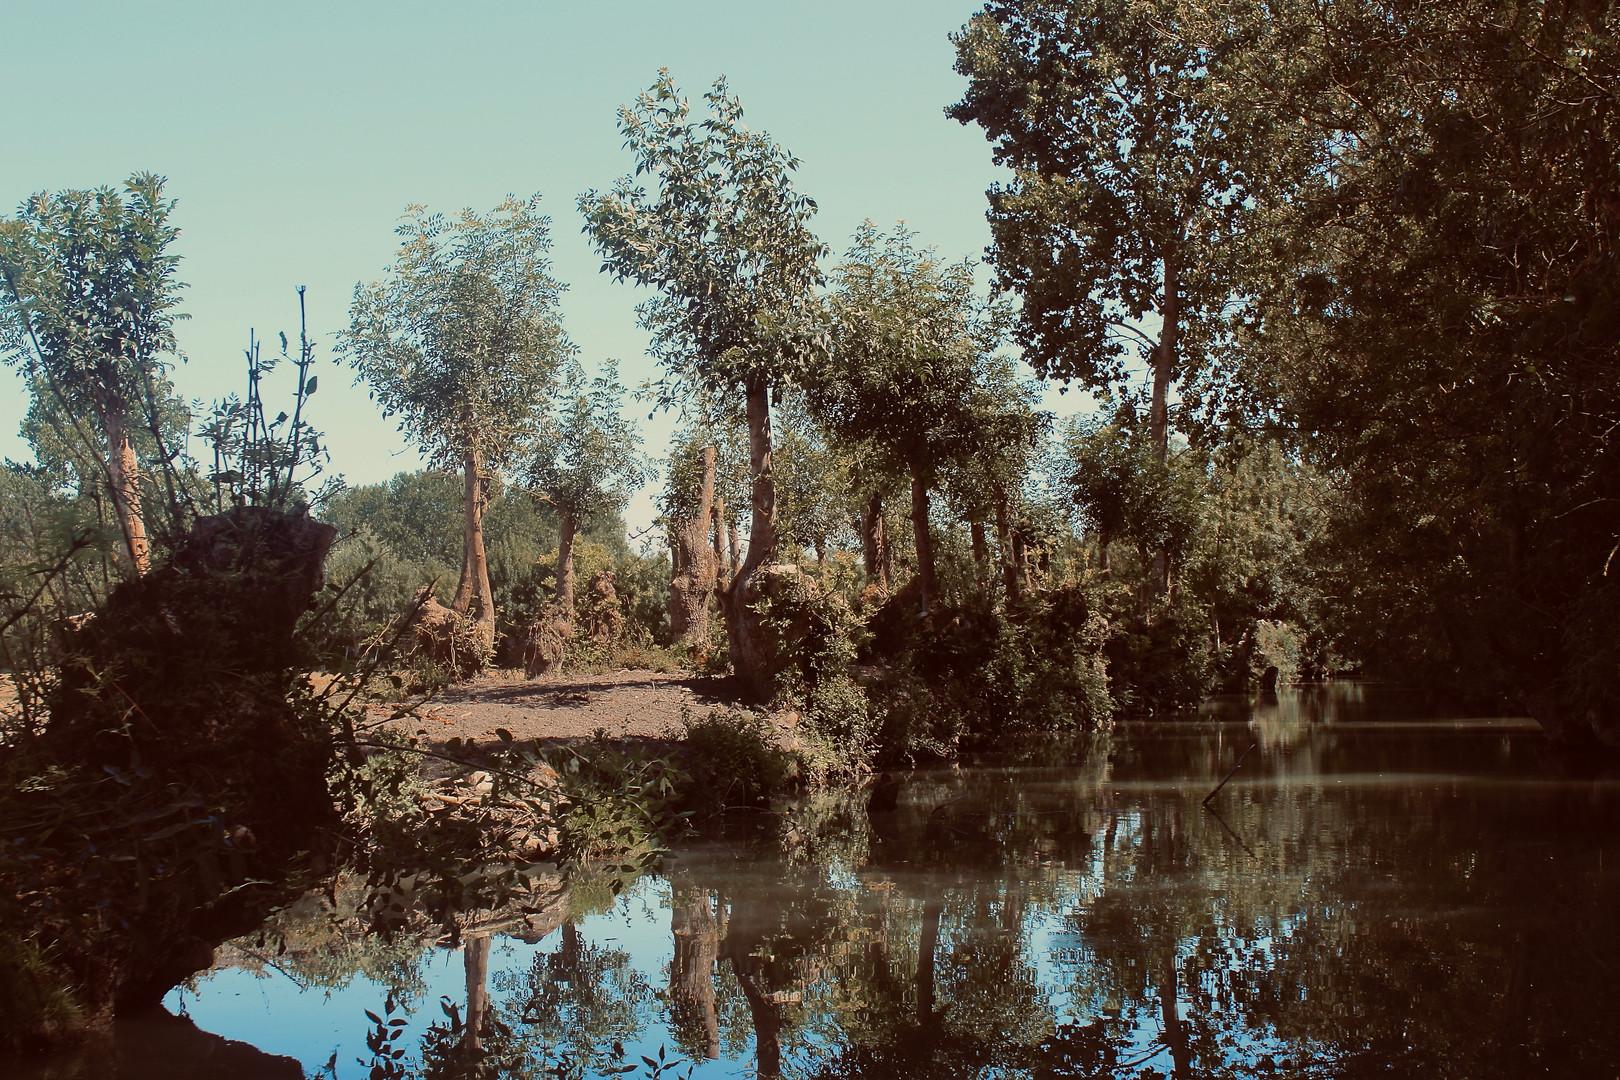 Relaxing River Ride